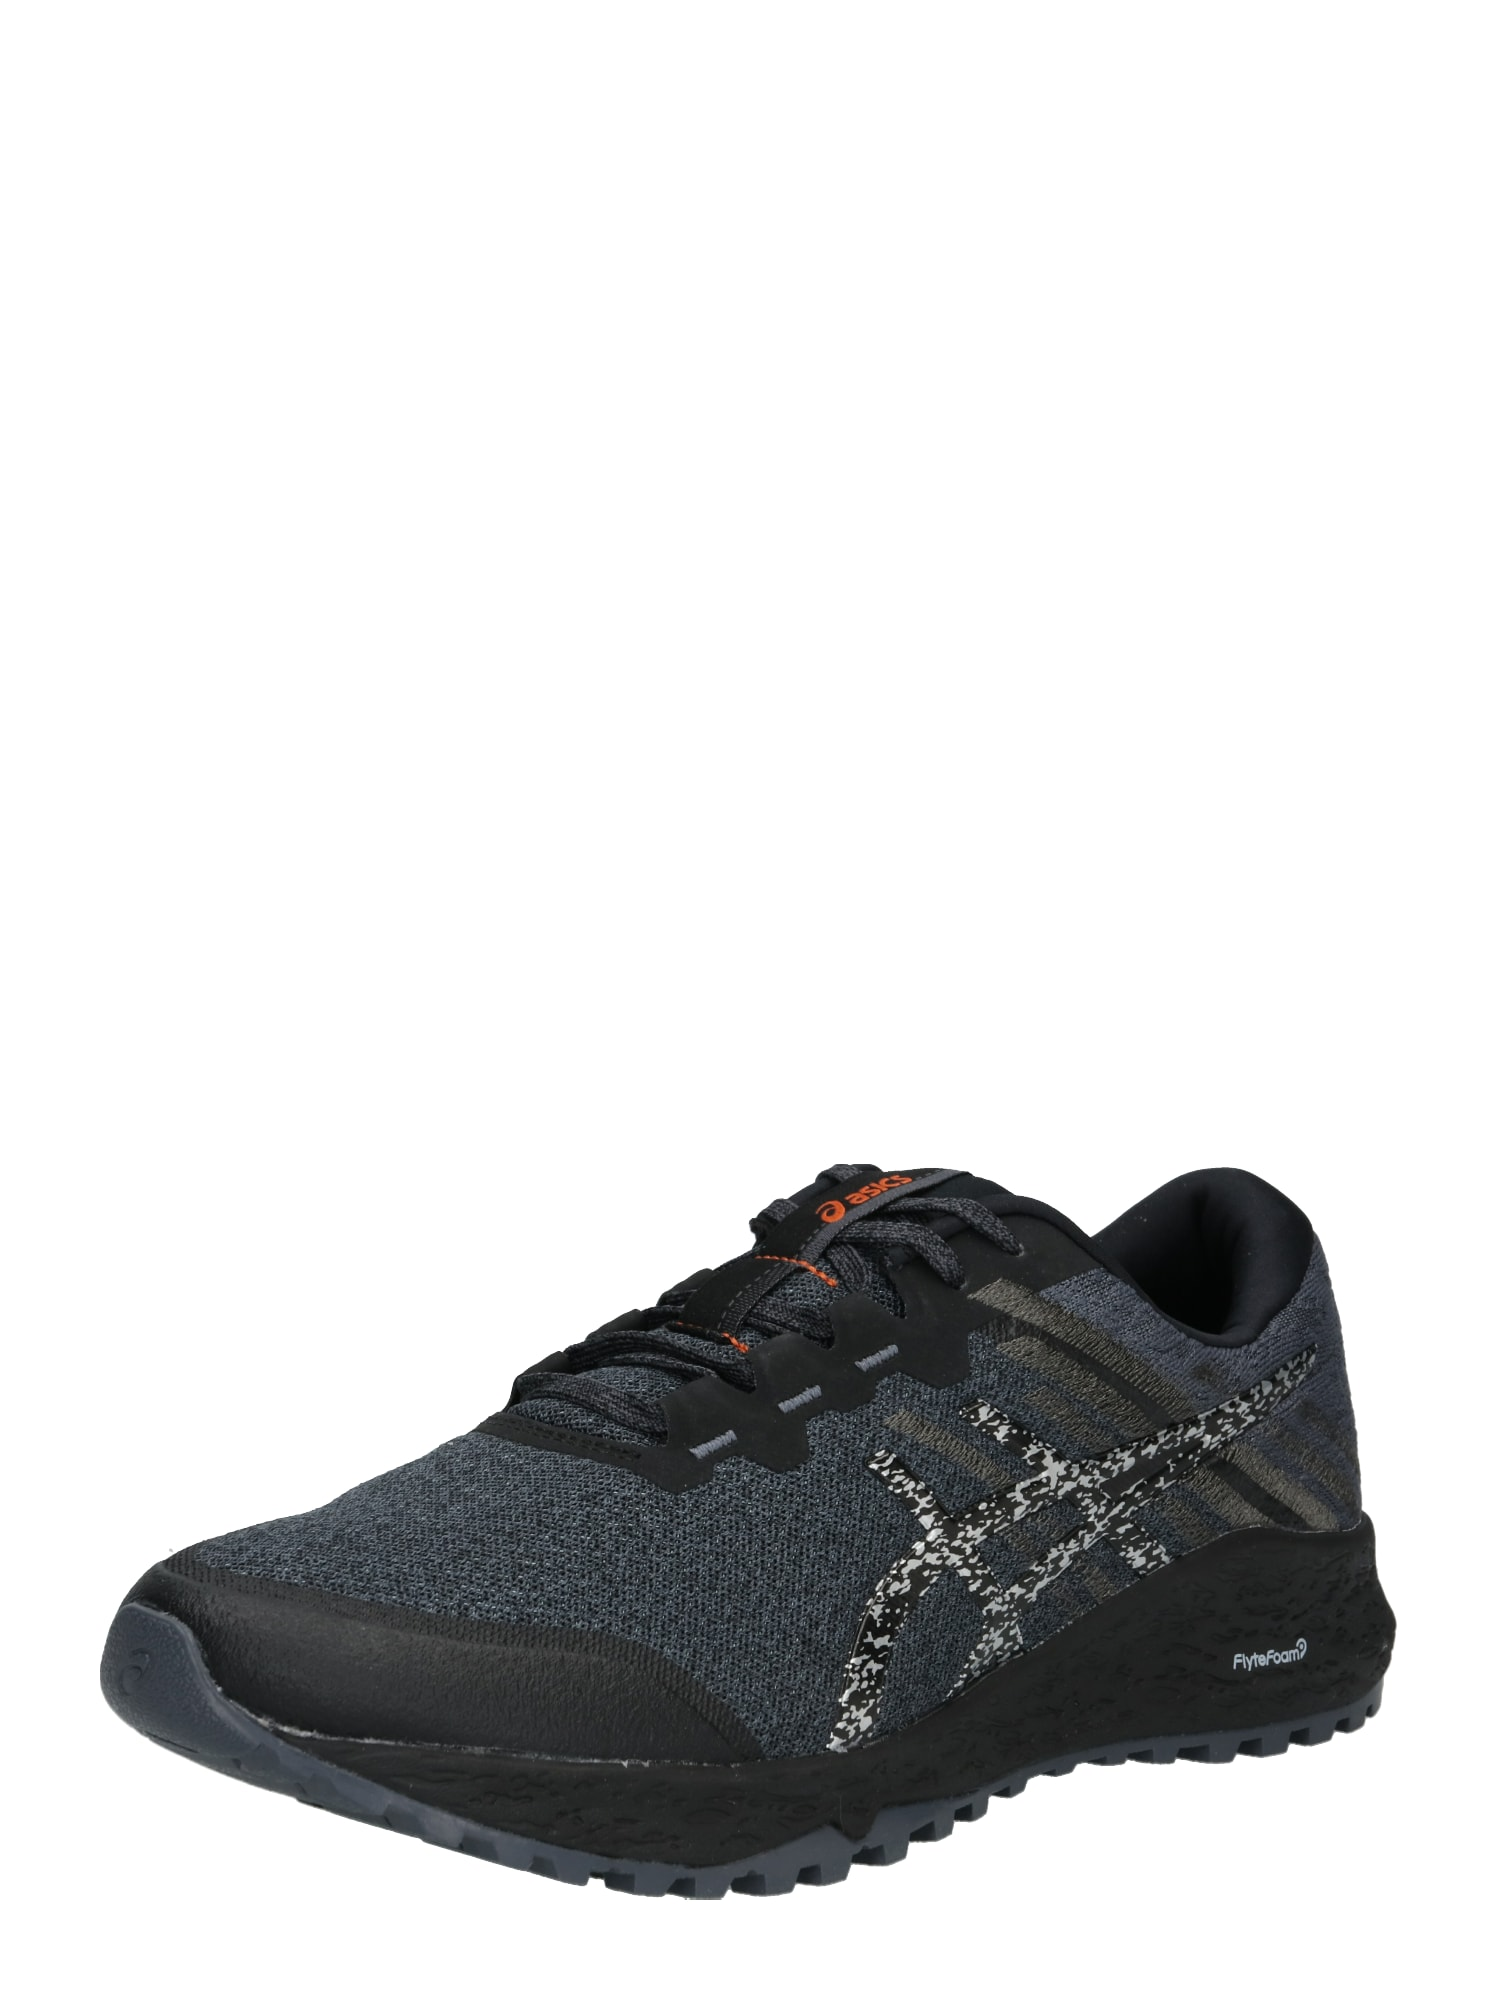 Běžecká obuv ALPINE XT 2 tmavě šedá stříbrná ASICS